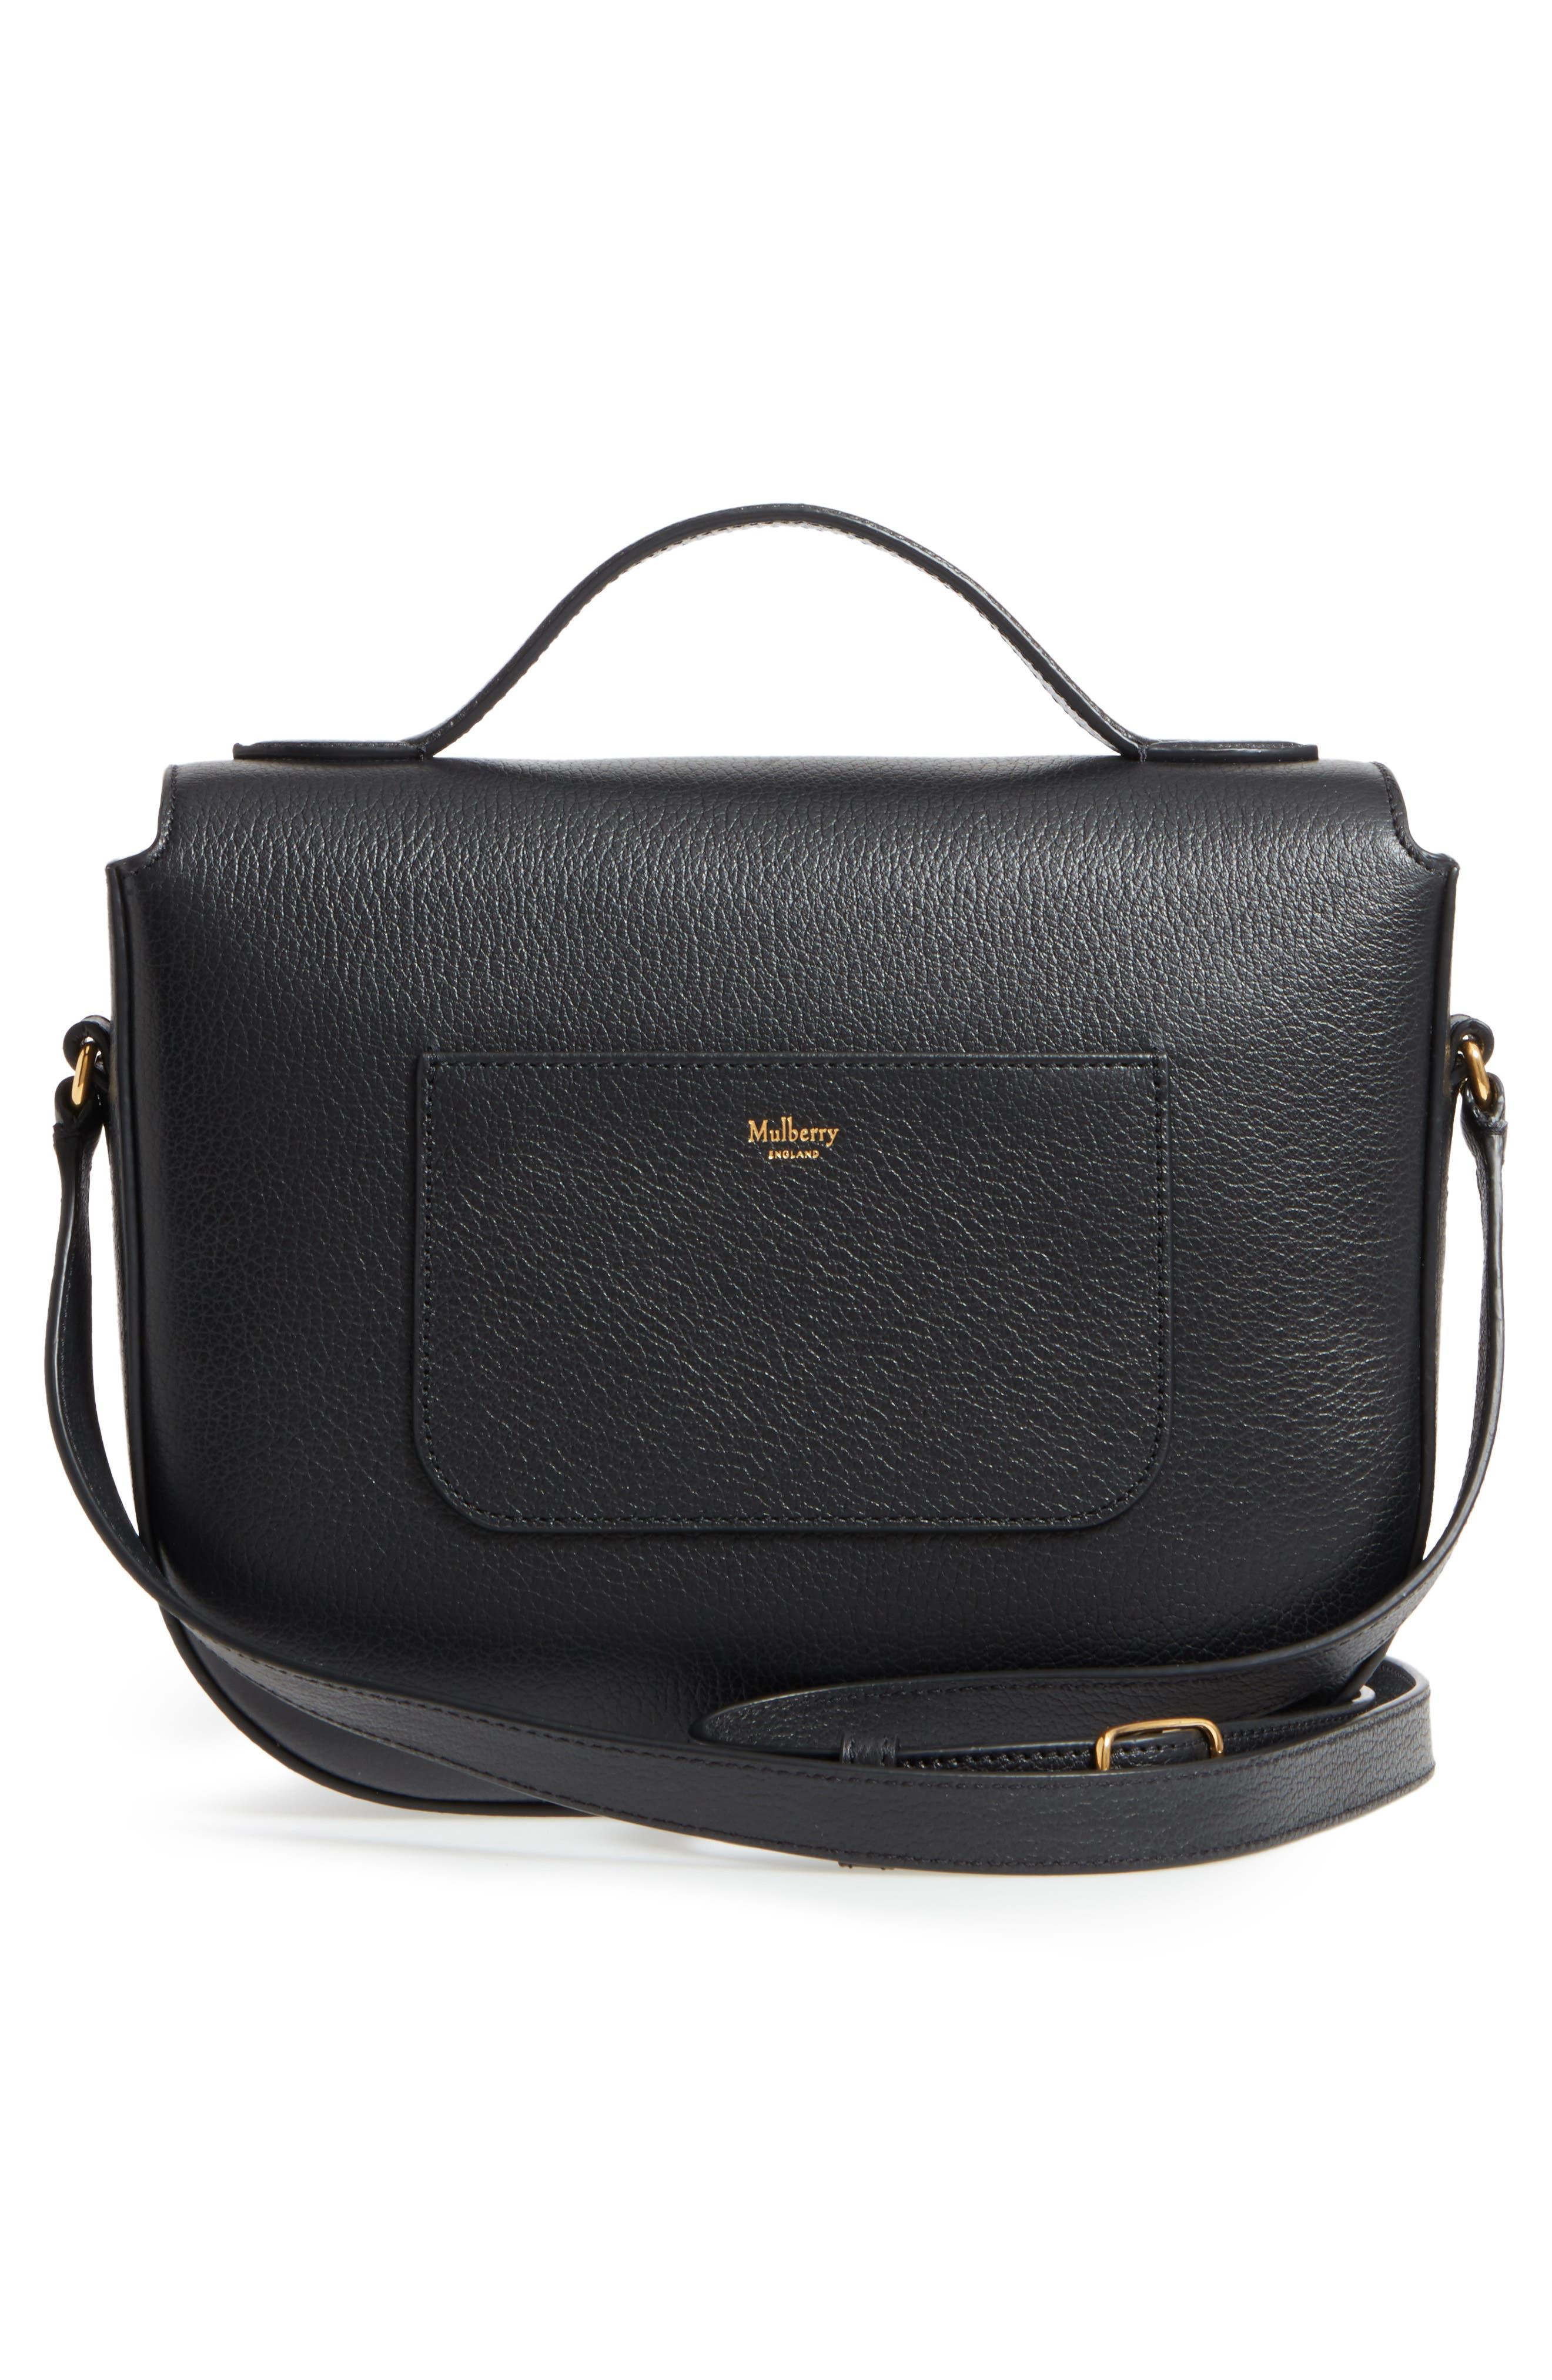 Tenby Calfskin Leather Crossbody Bag,                             Alternate thumbnail 3, color,                             001